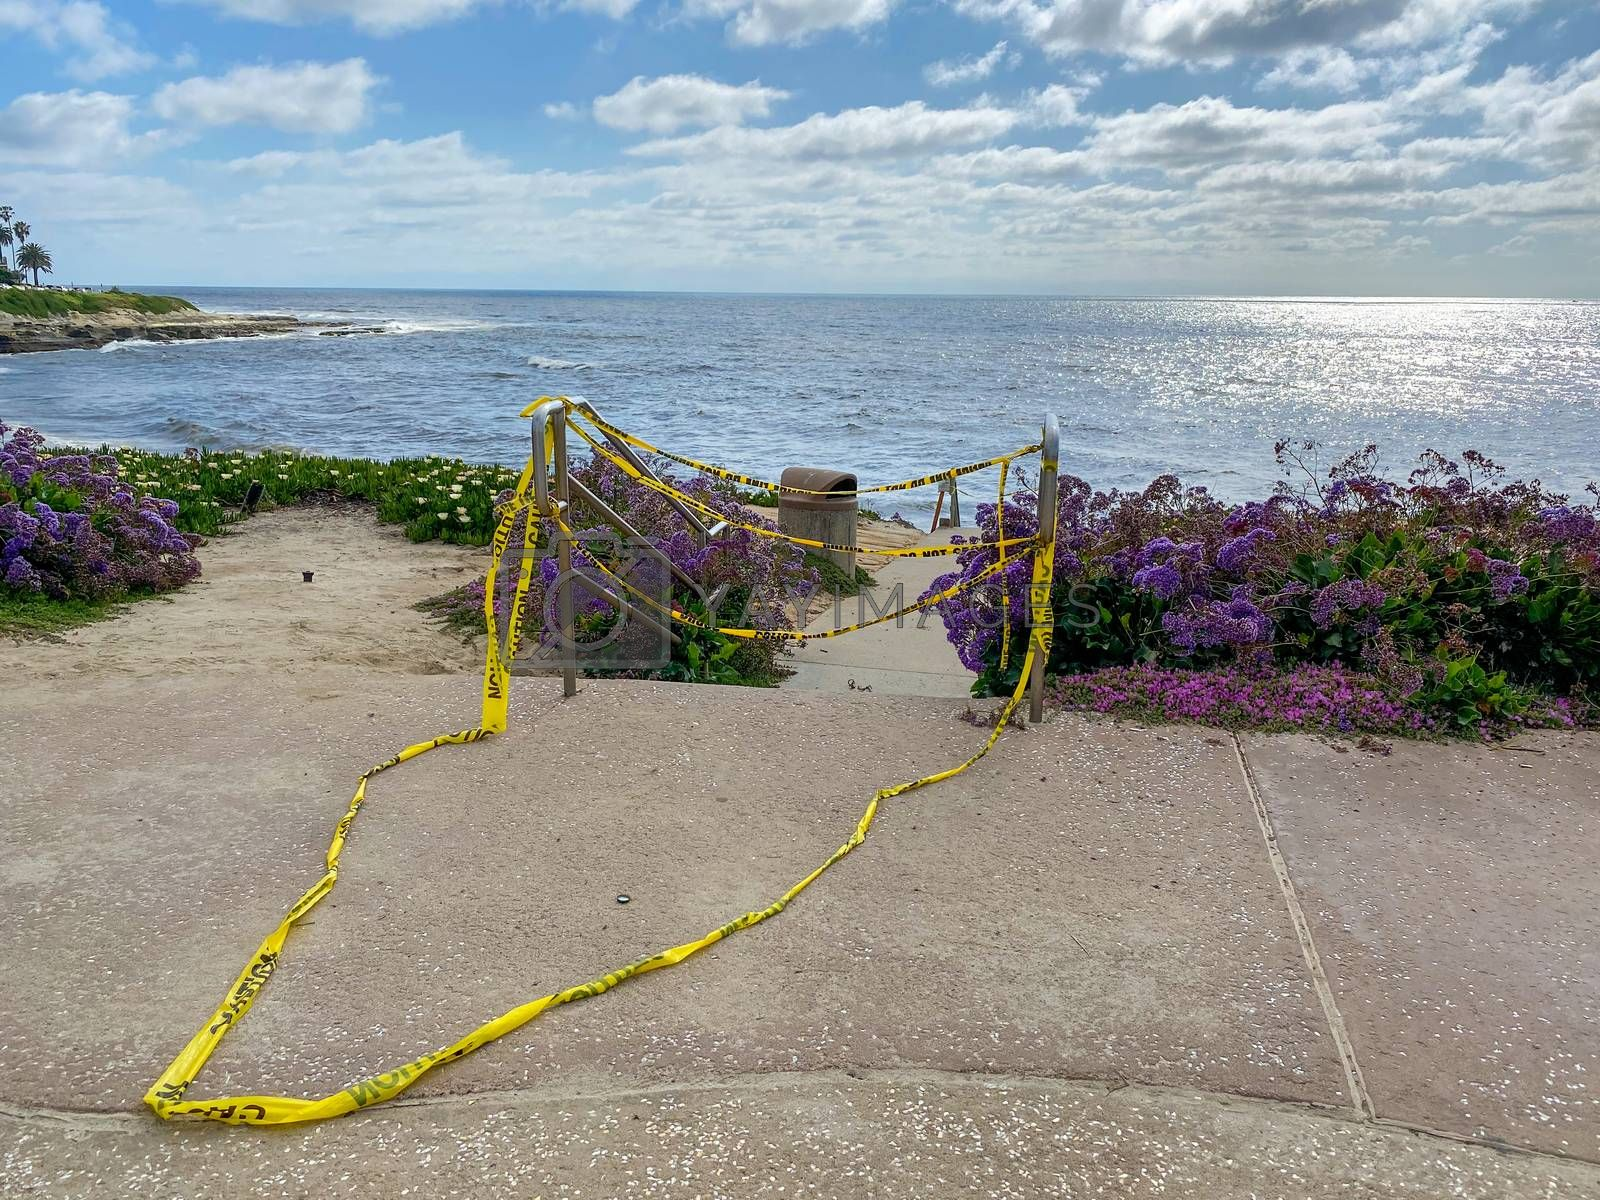 CClosed beach of La Jolla with informative signage during COVID-19 pandemic. Coronavirus virus panic and quarantine San Diego, USA, April 18th, 2020